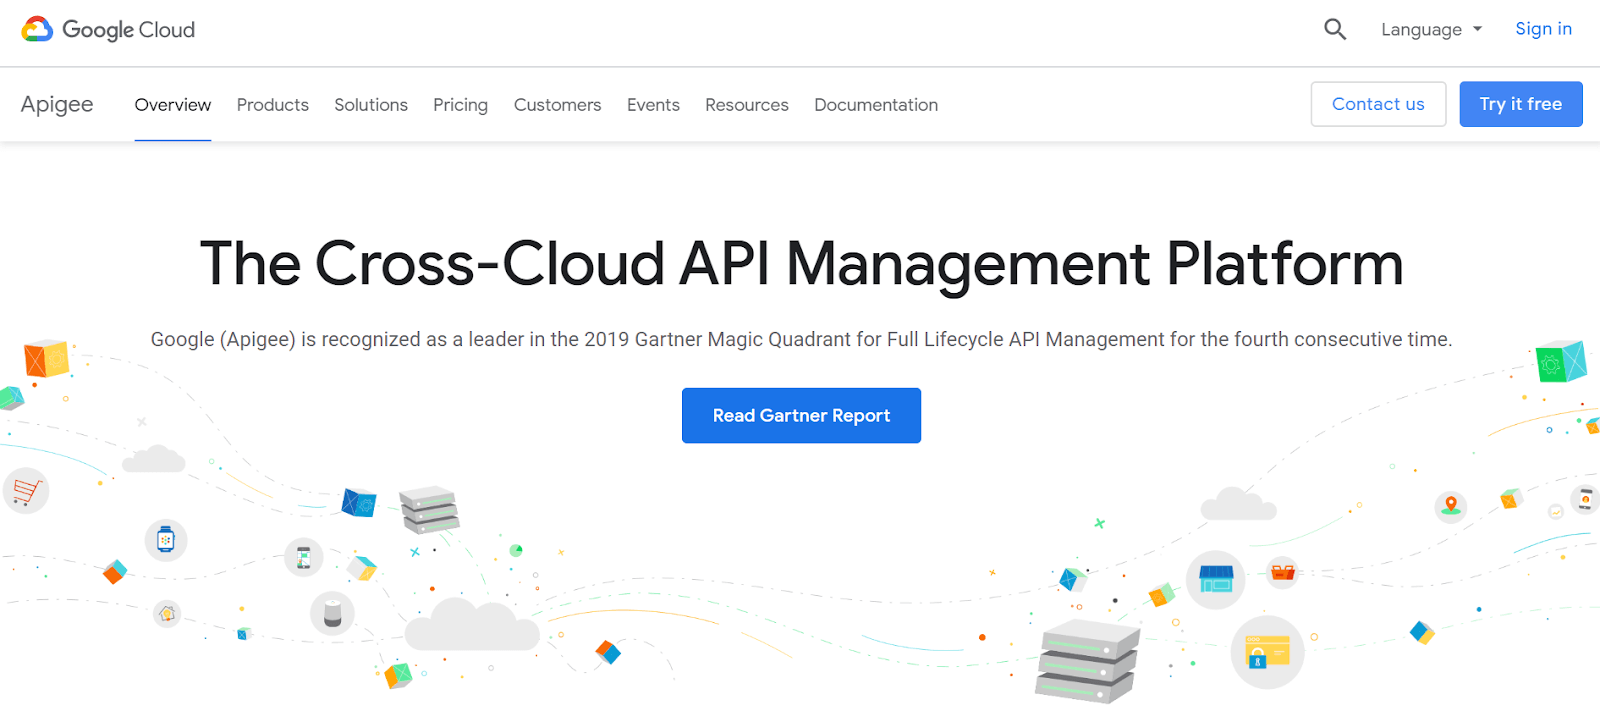 Apigee API Management Tools